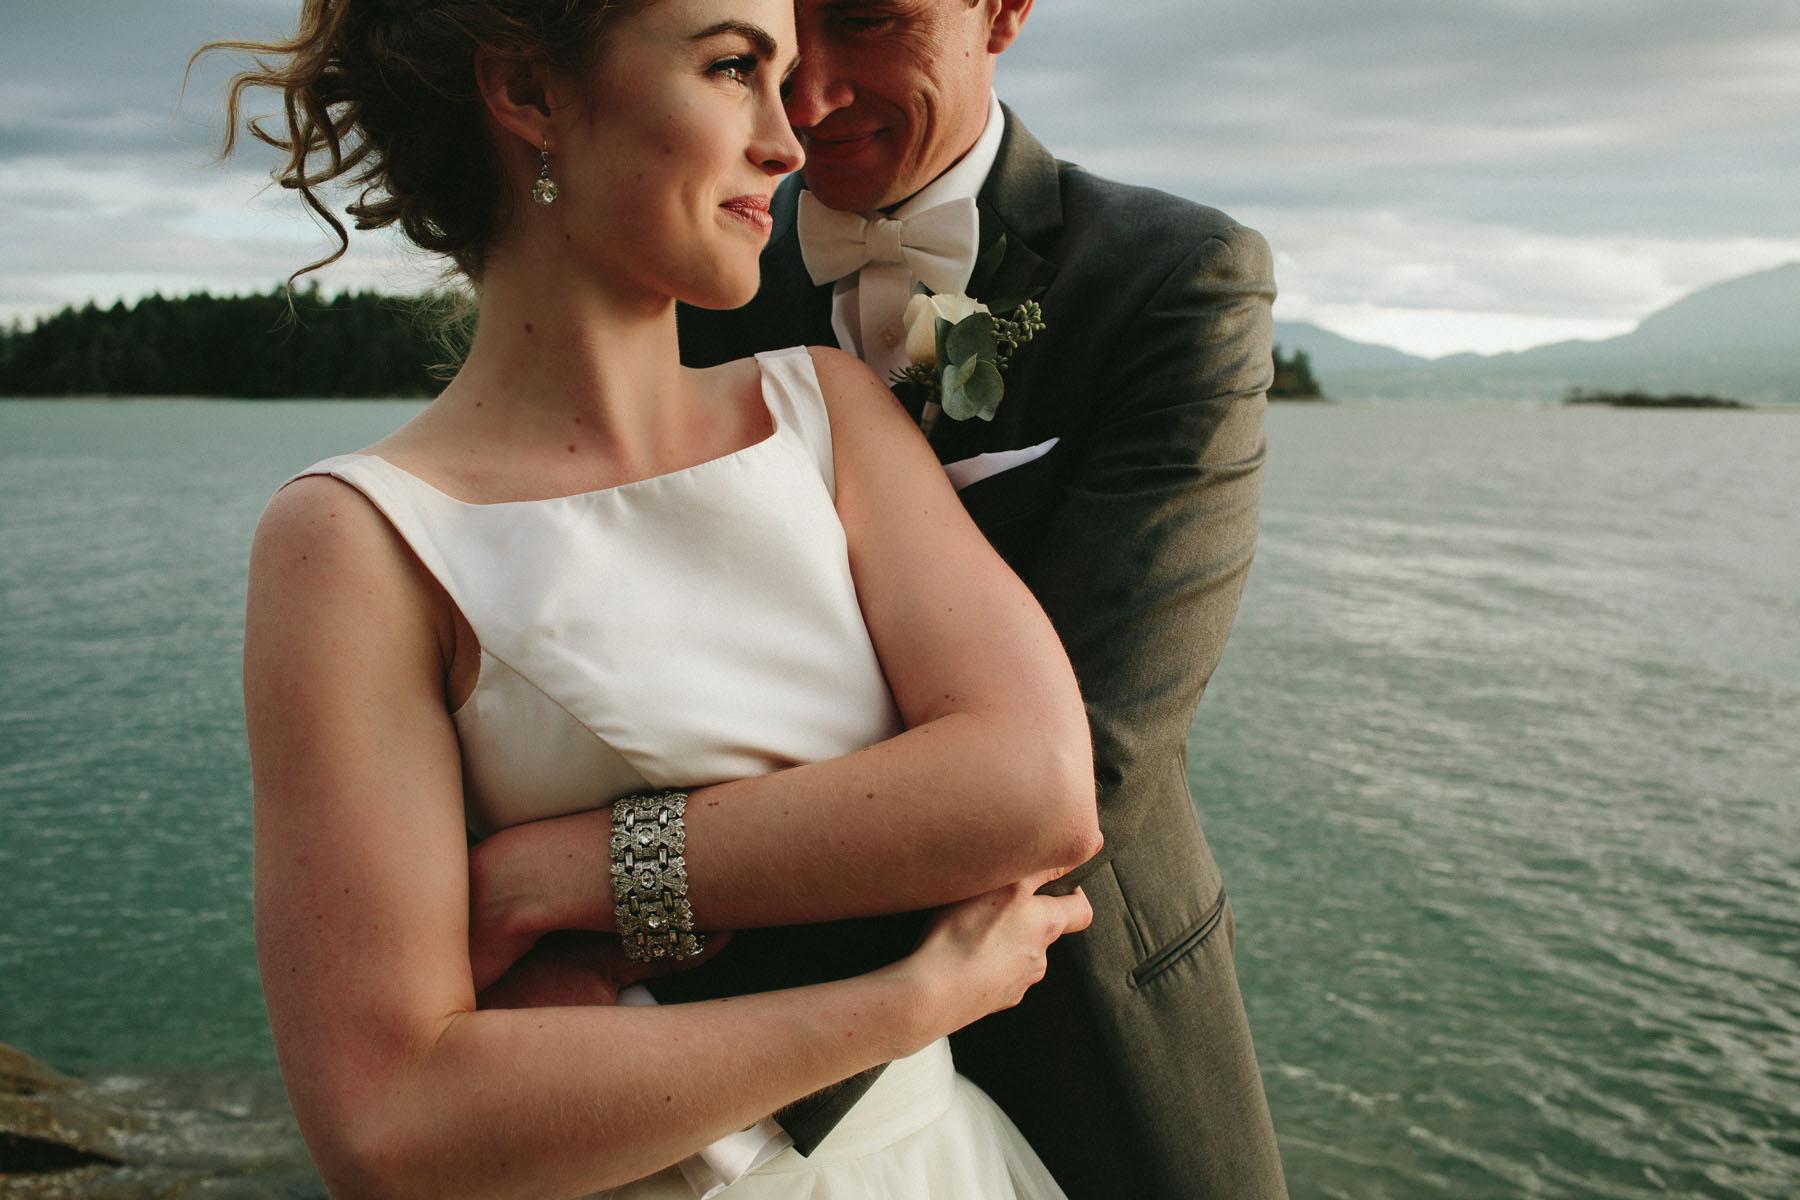 thetis-island-wedding-photographer-rp-rn-136.jpg